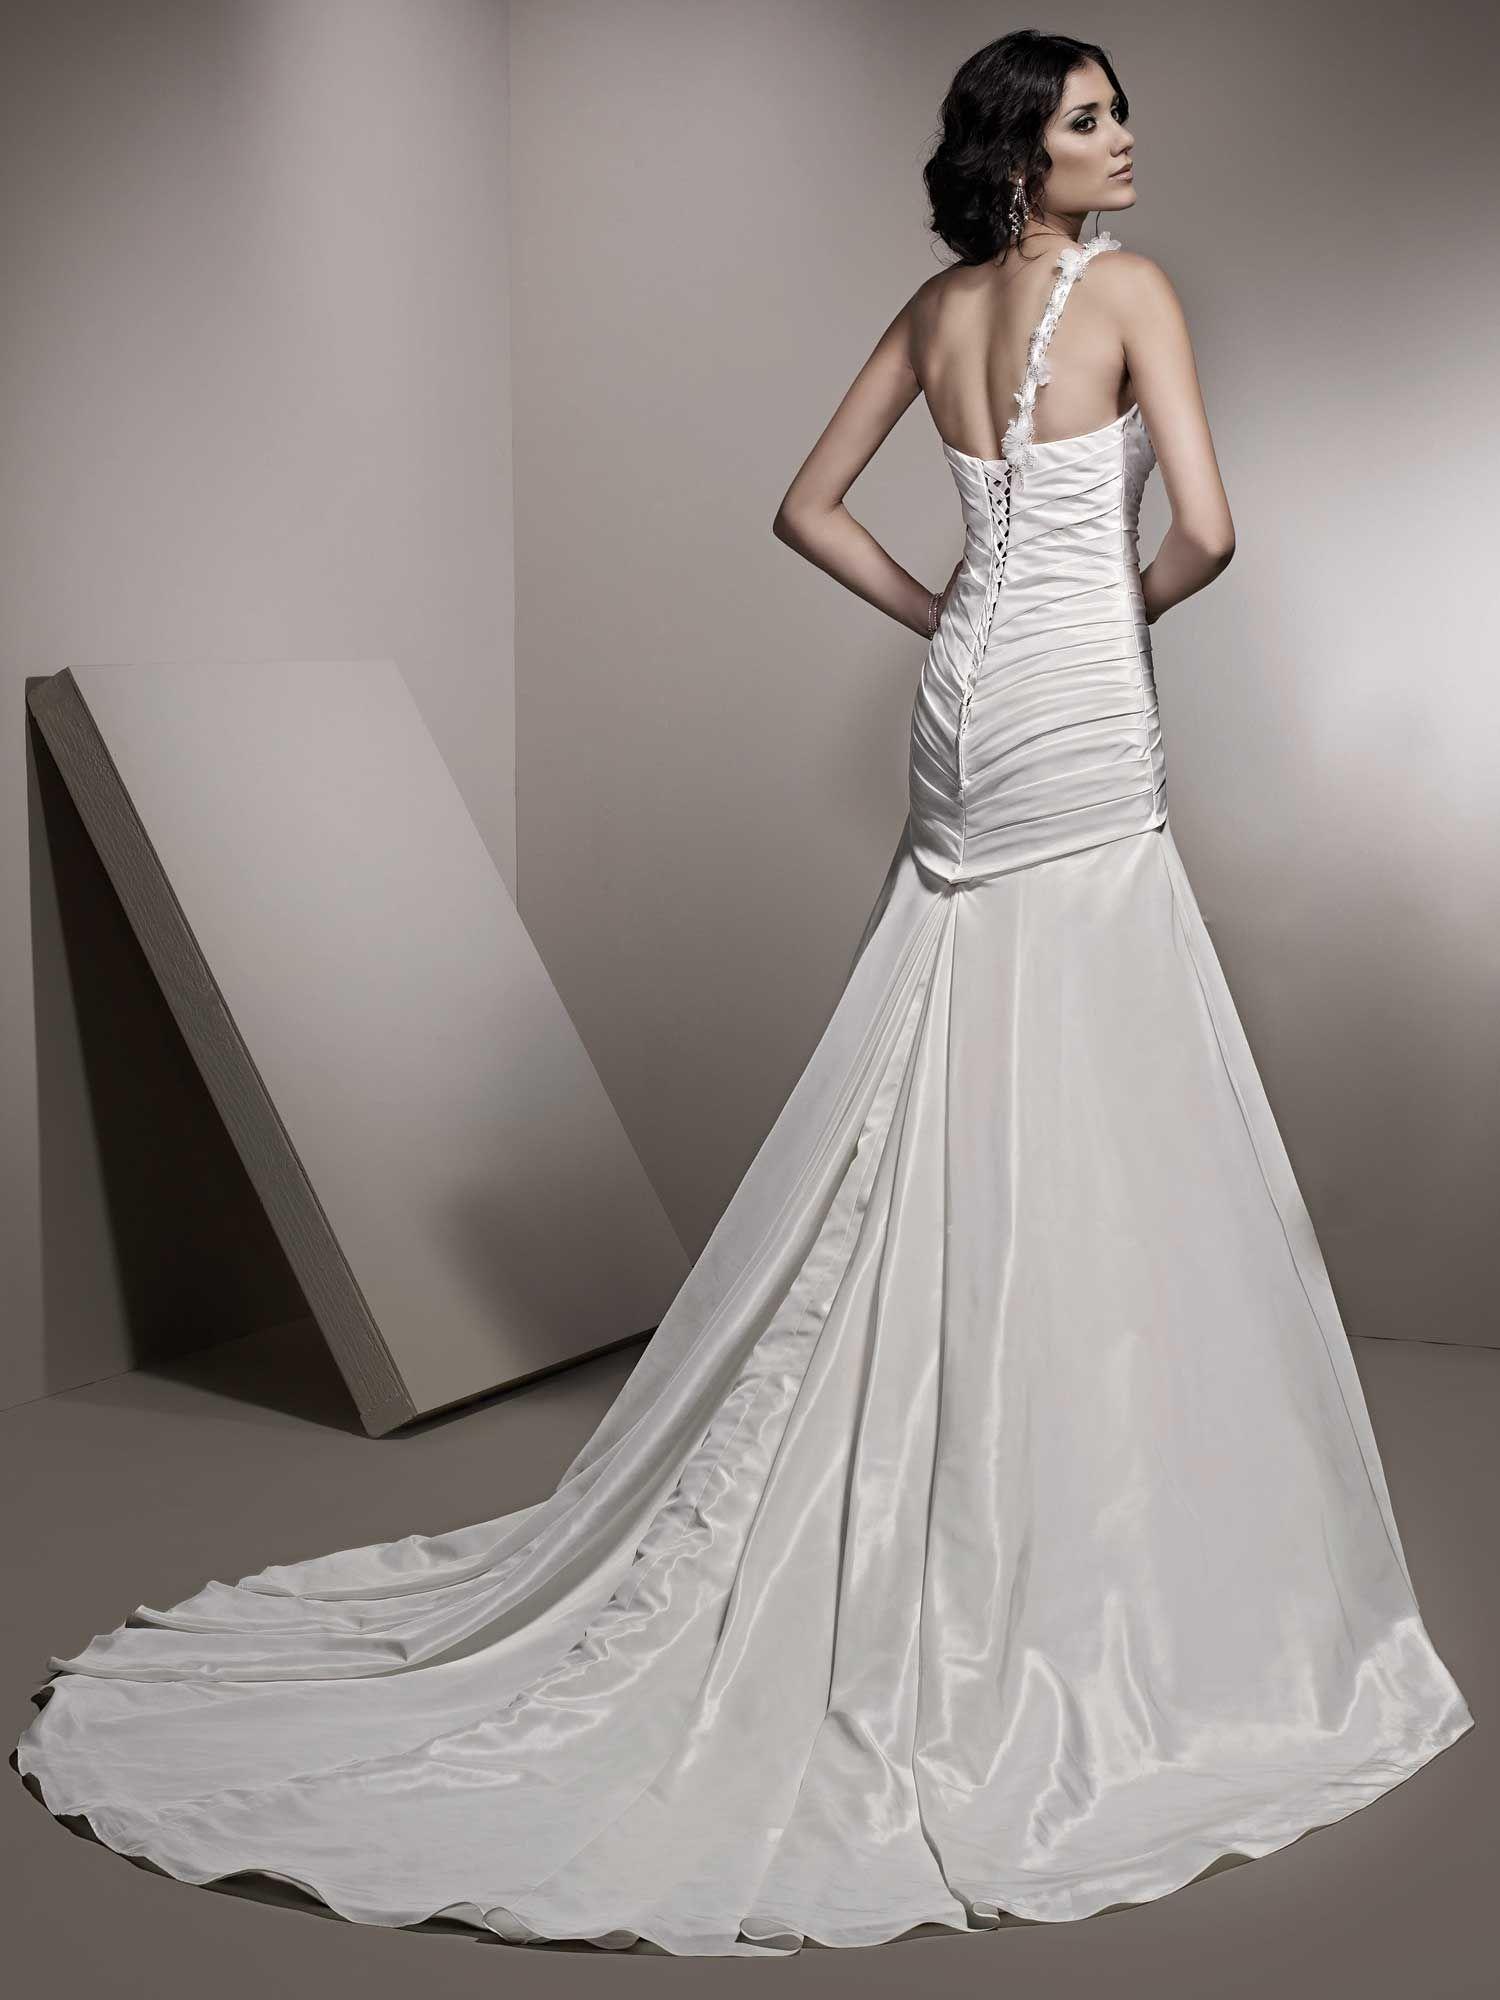 One strap wedding dress  Breathtaking  The Dress  Pinterest